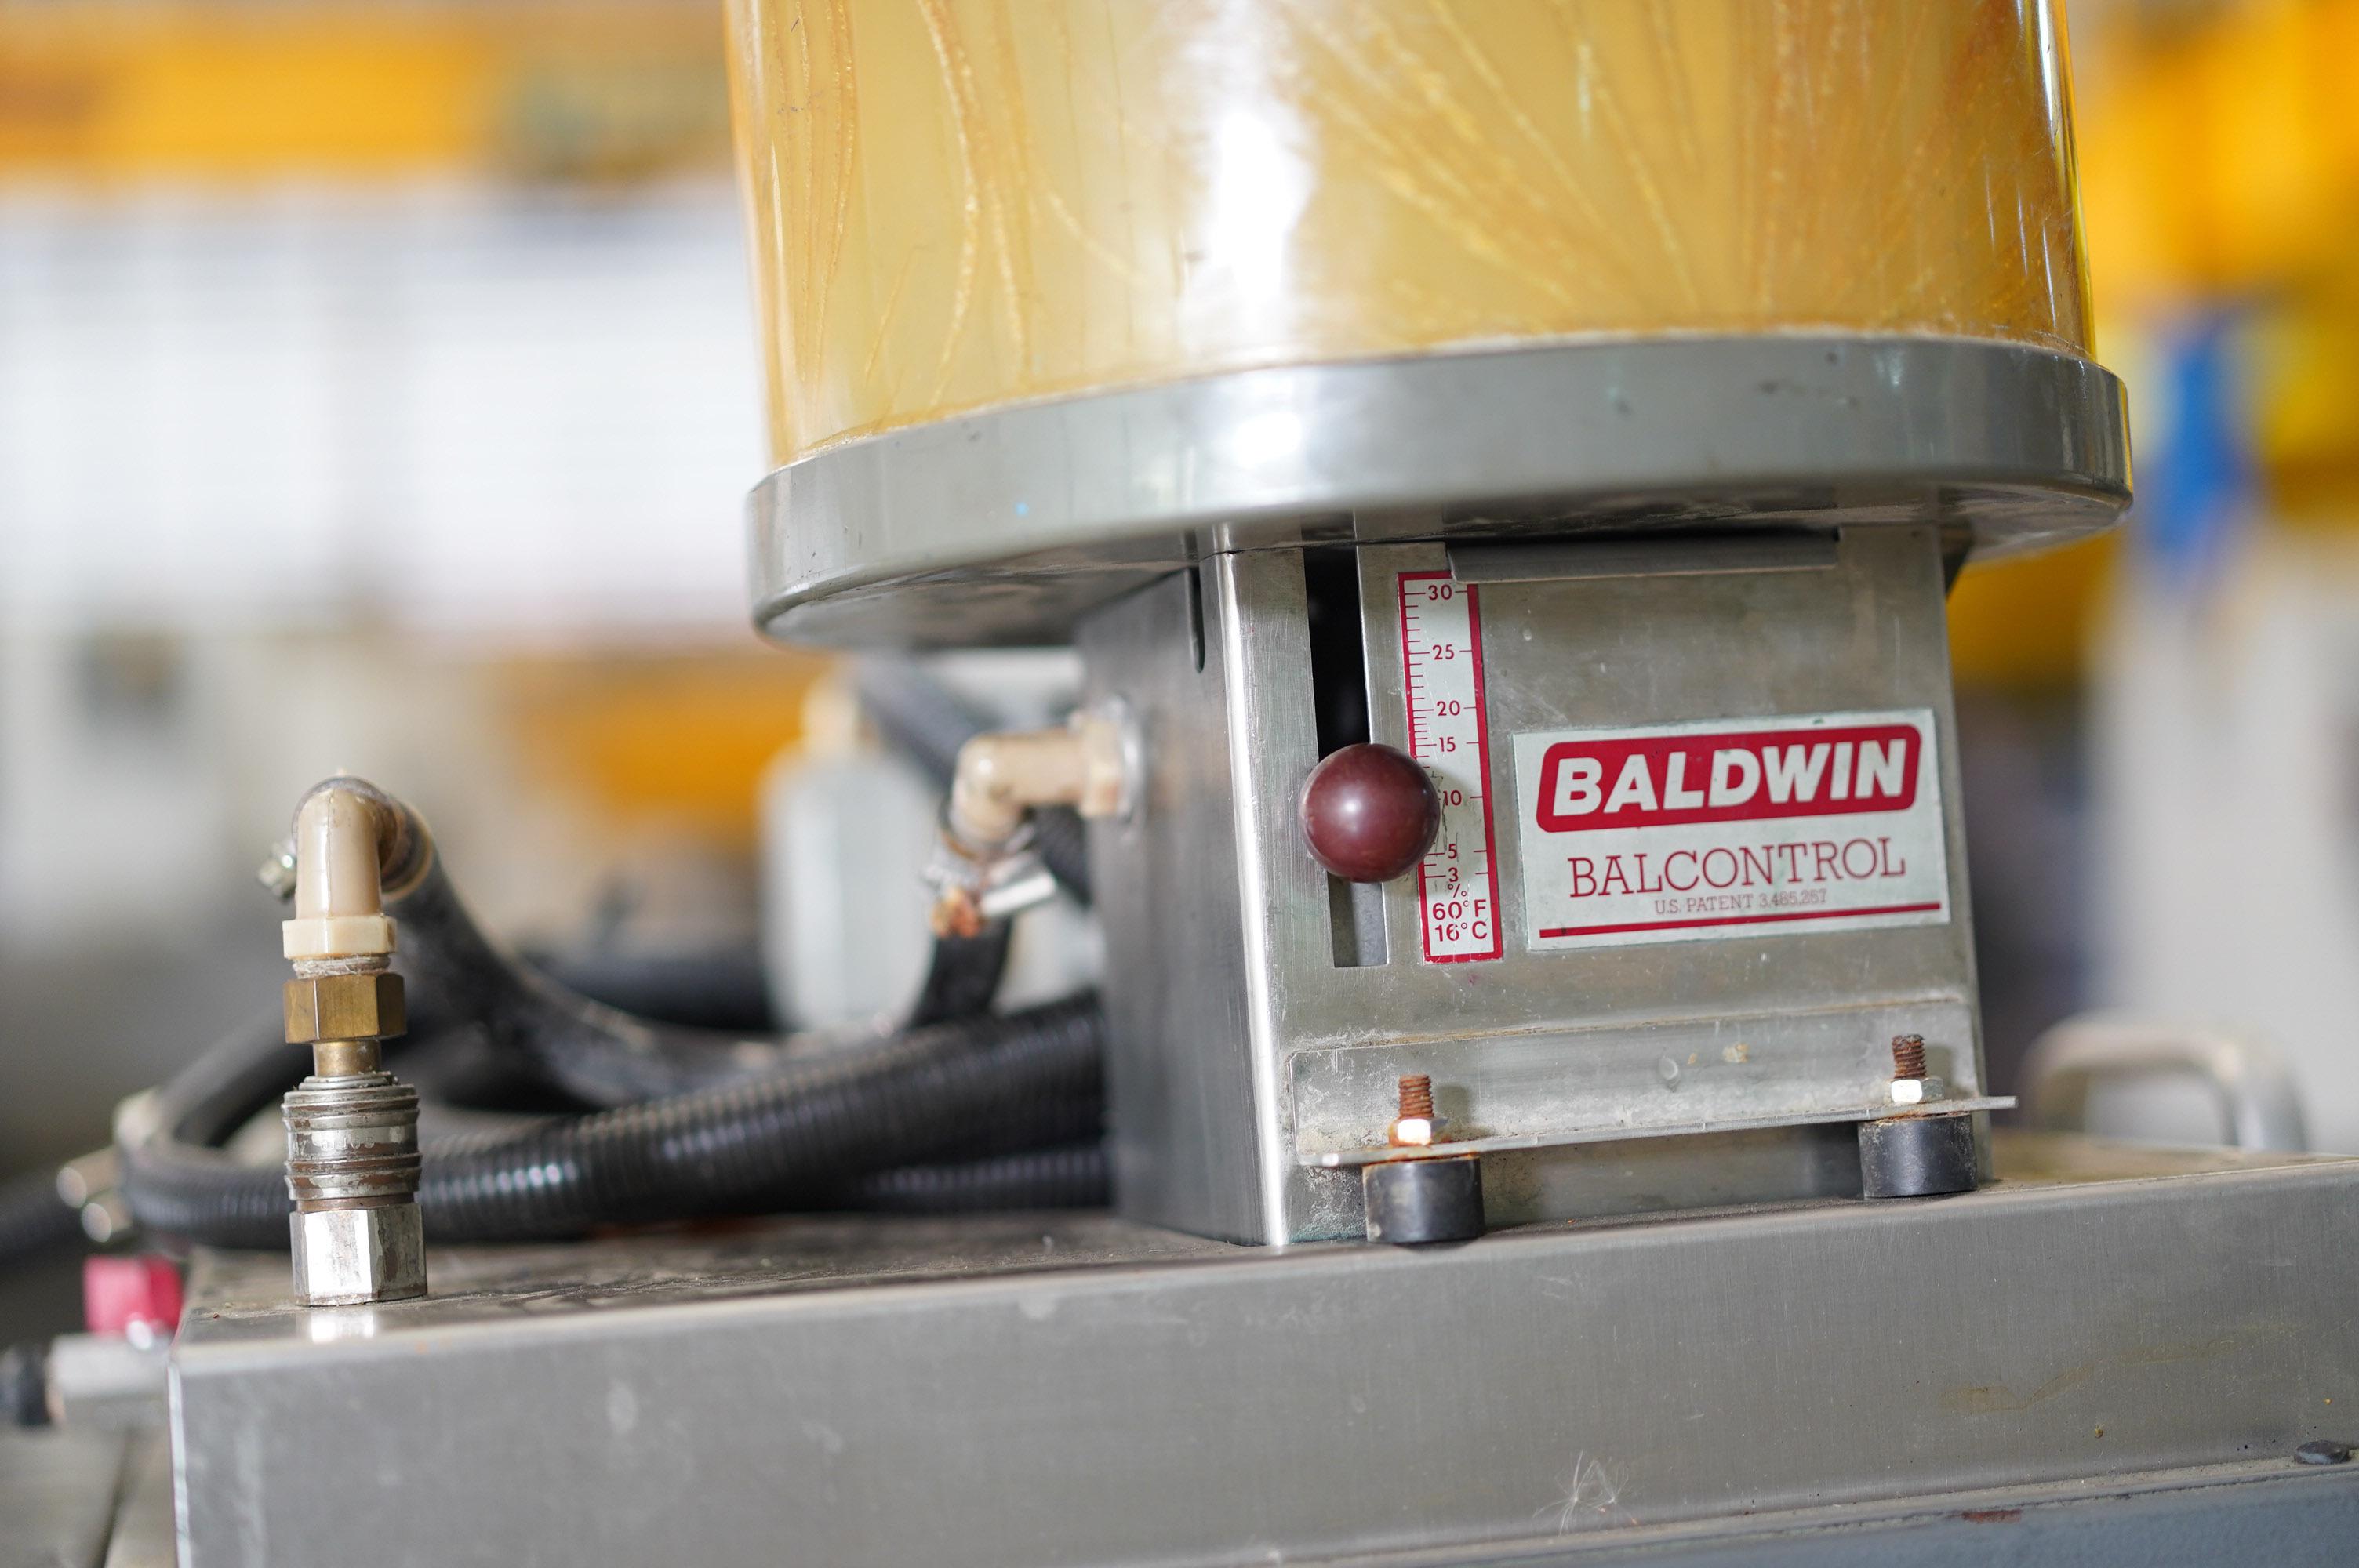 Baldwin 851-100 (386)